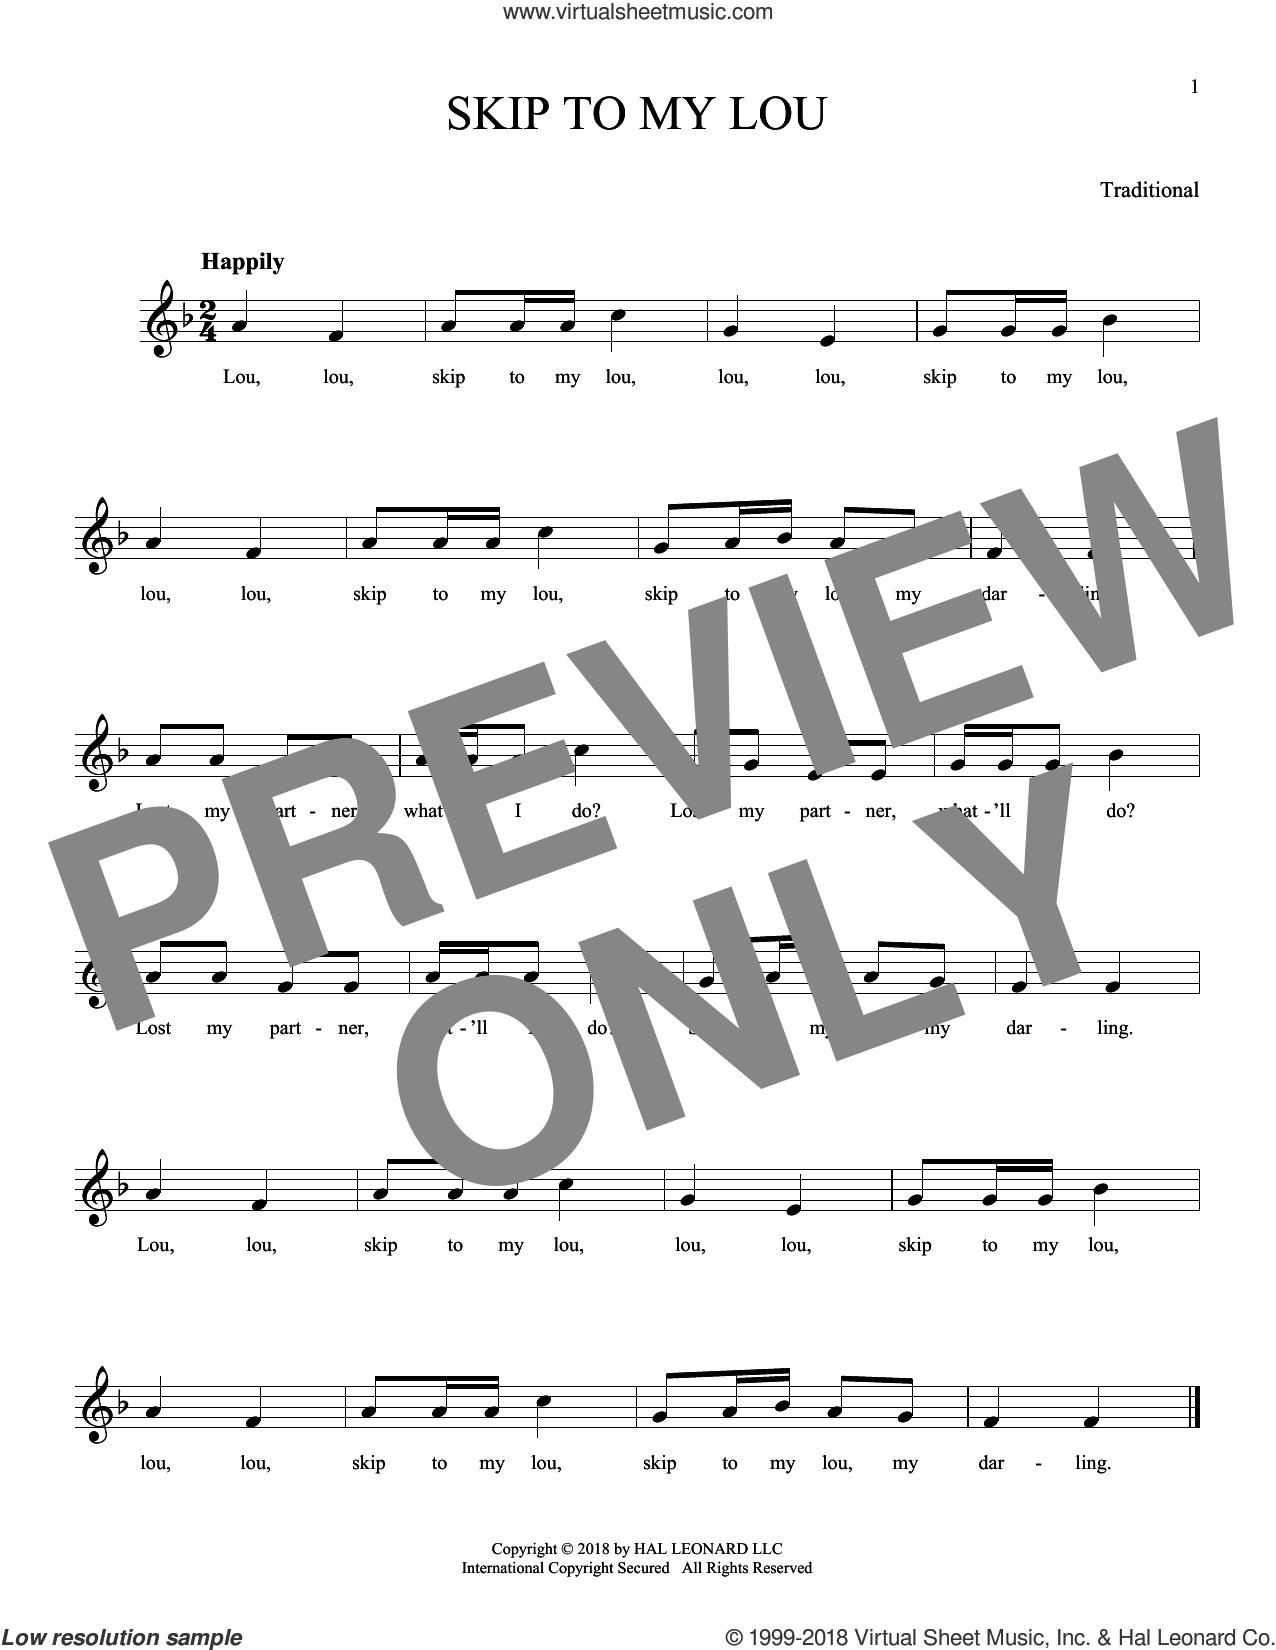 Skip To My Lou sheet music for ocarina solo, intermediate skill level